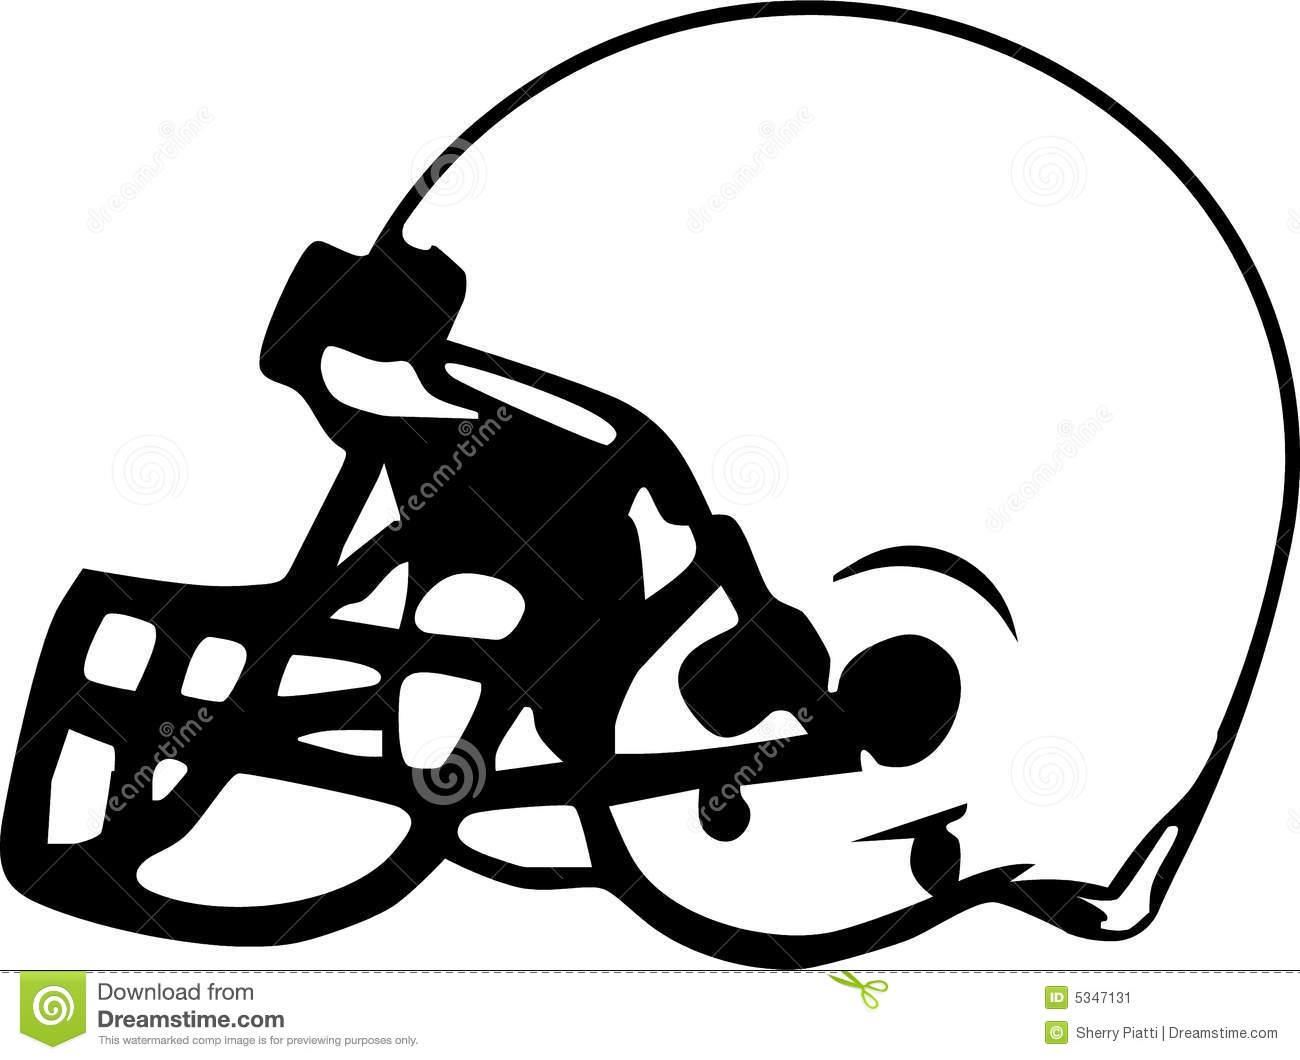 Football jpg clipart clipart black and white download Nfl Football Helmet Clipart - Clipart Kid clipart black and white download